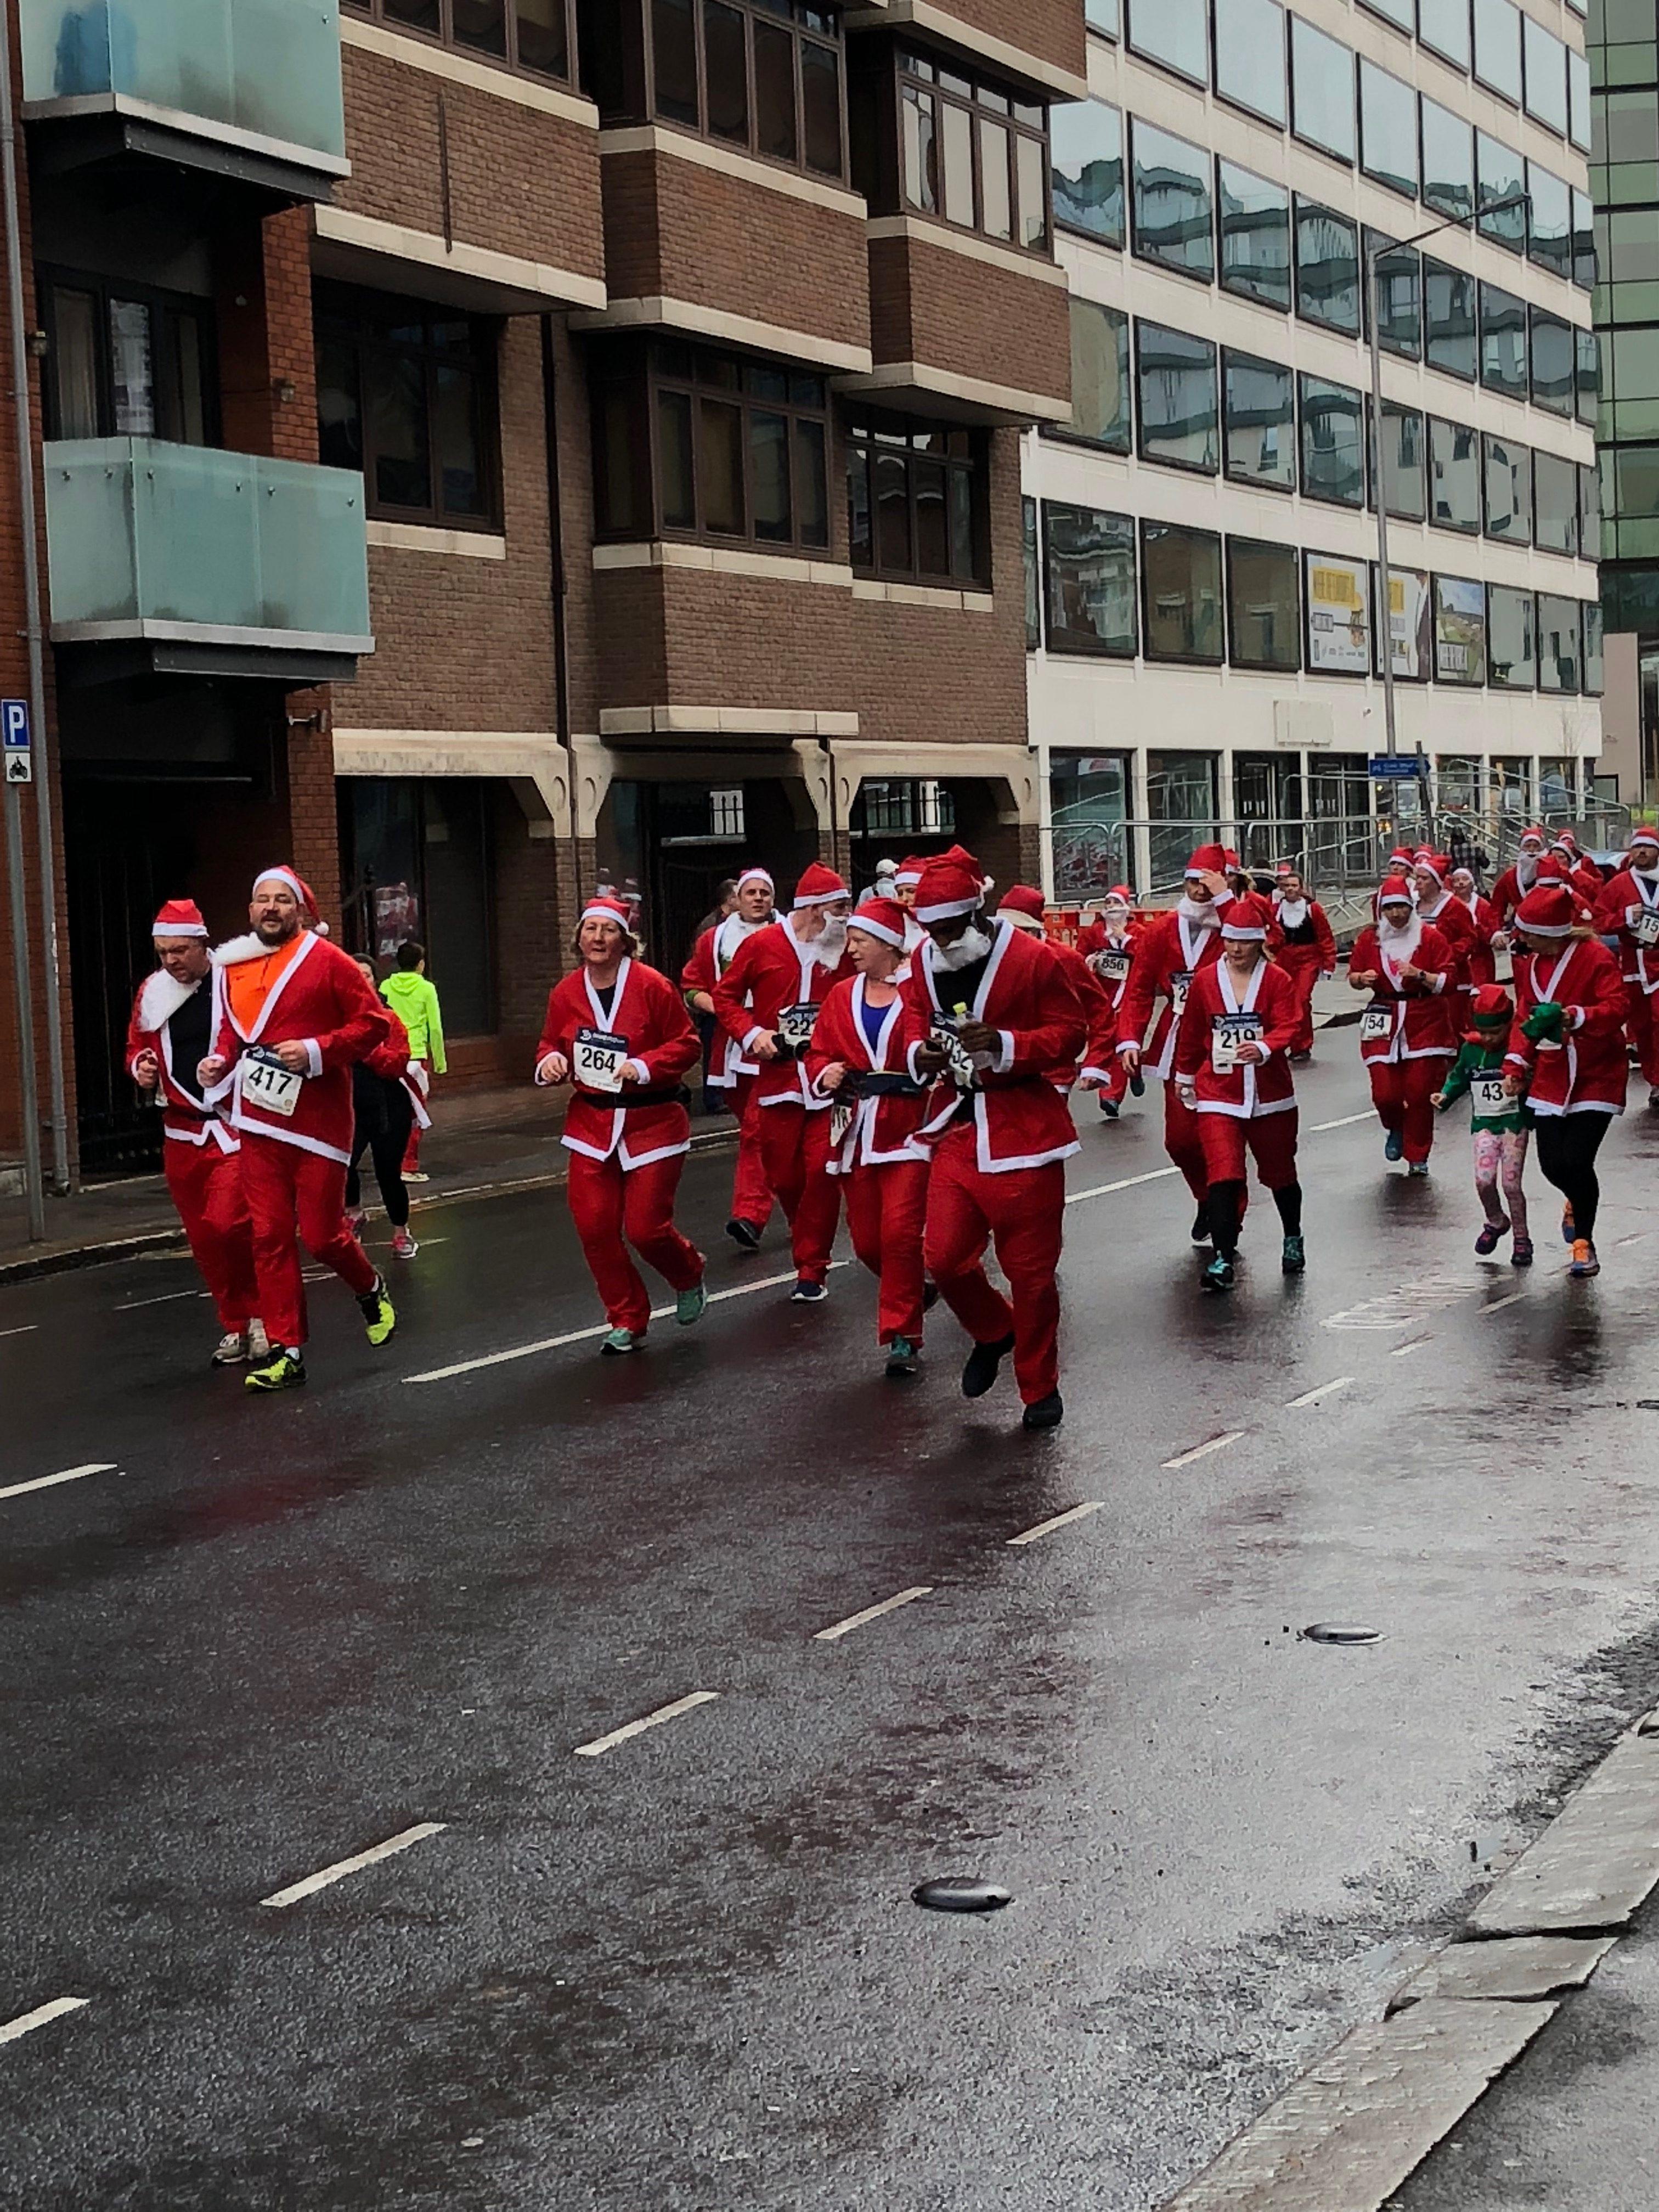 Dan running the santa run for No5